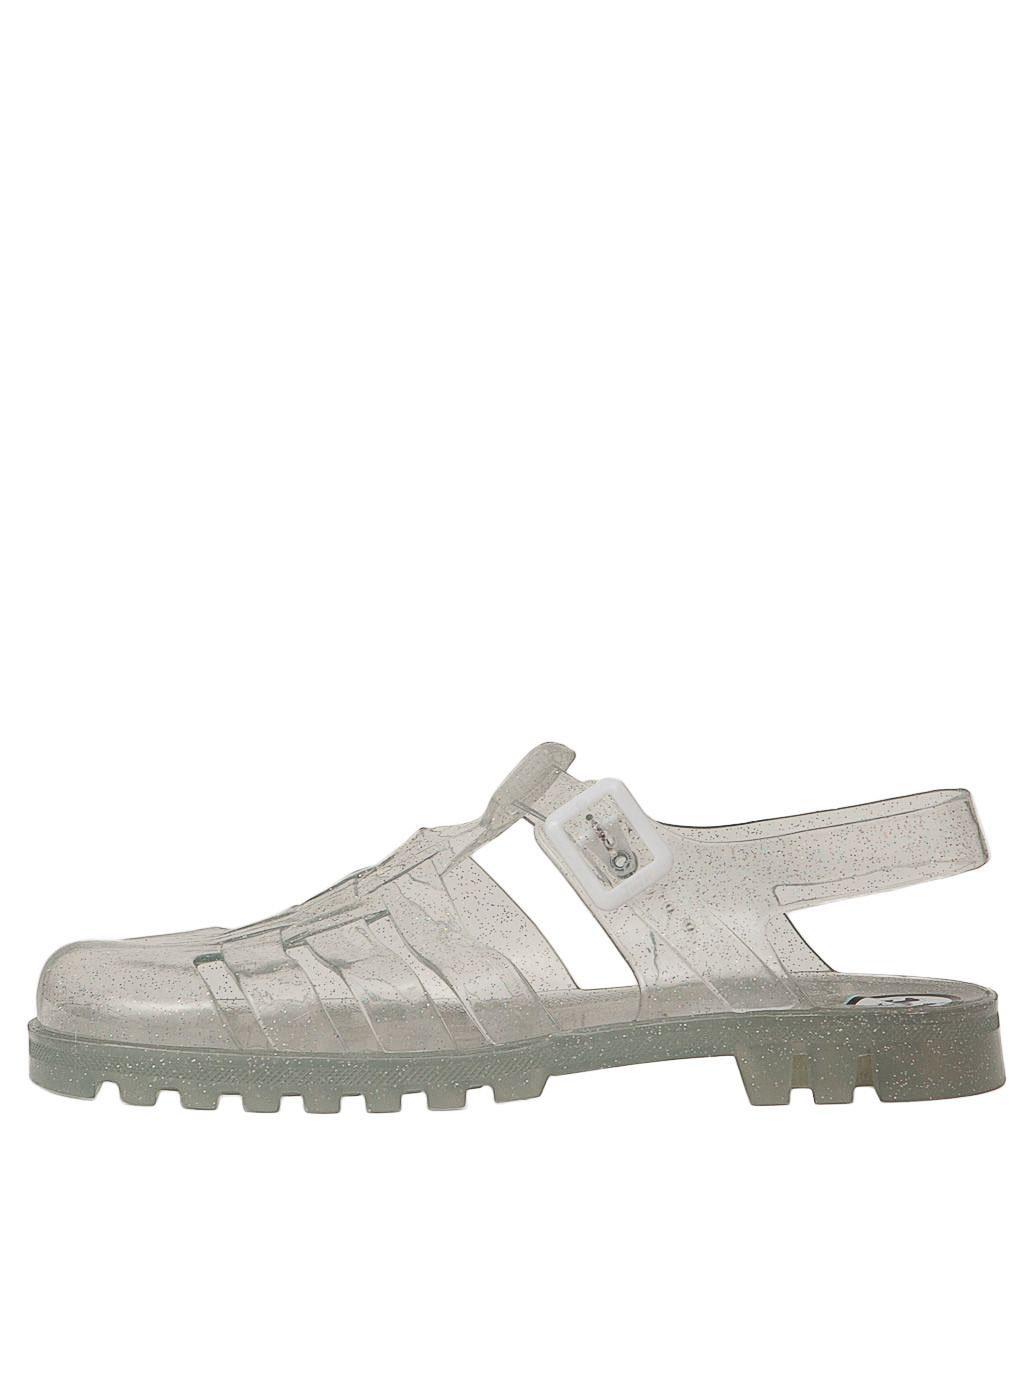 Black jelly sandals american apparel - Juju Maxi Jelly Sandals American Apparel